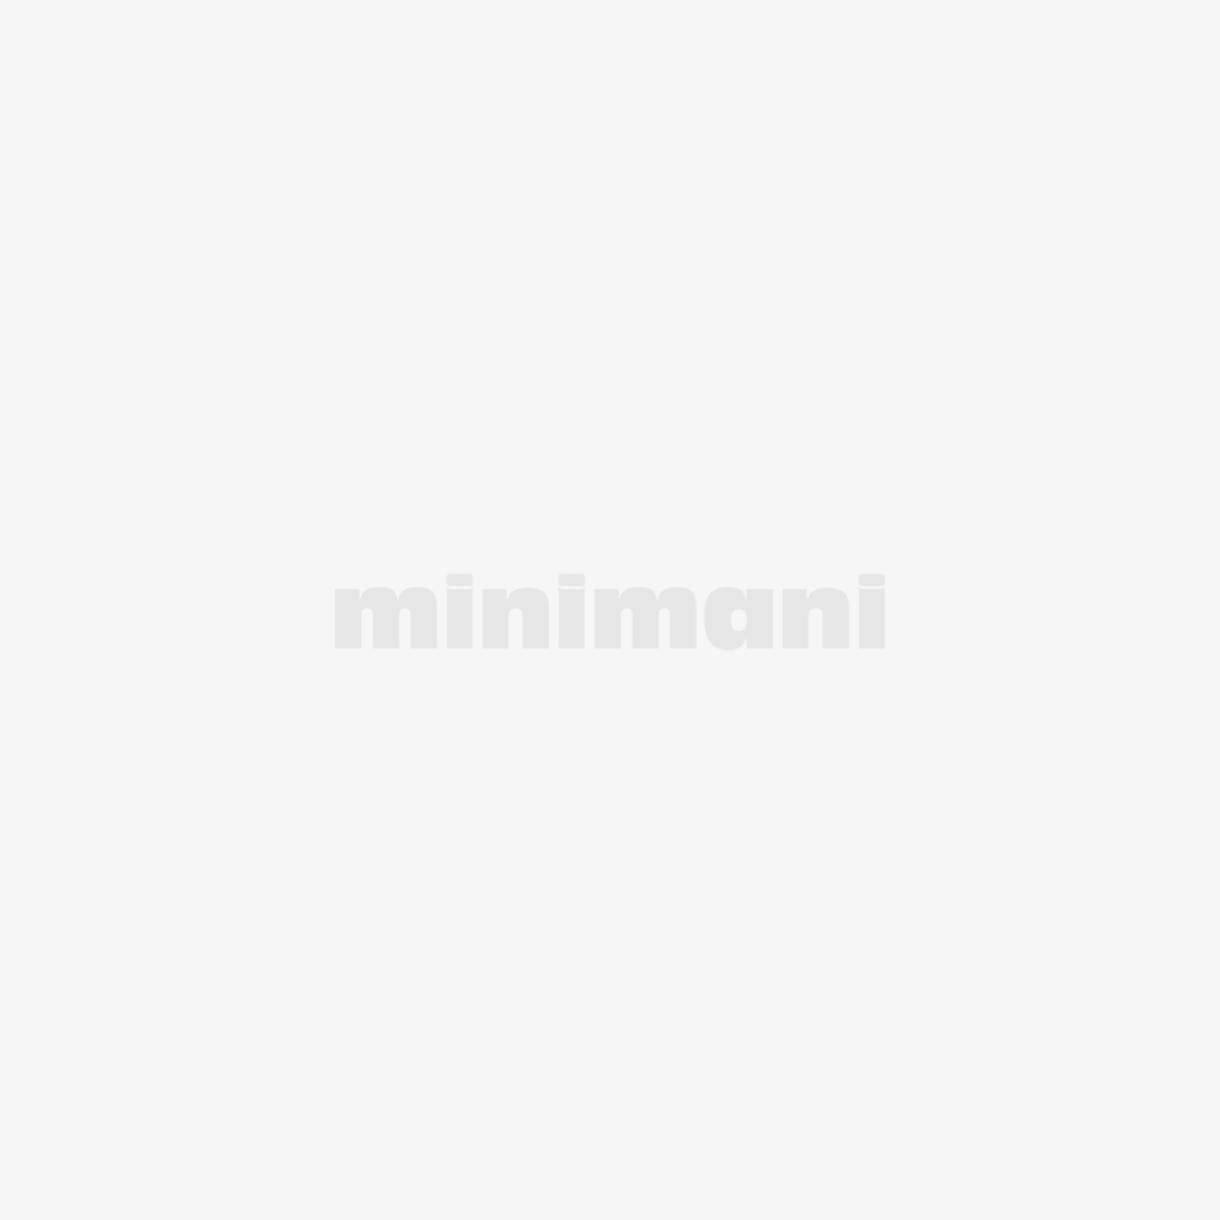 M-FILTER ILMANSUODATIN  MAP 6869 VOLVO440 460 480 TURB